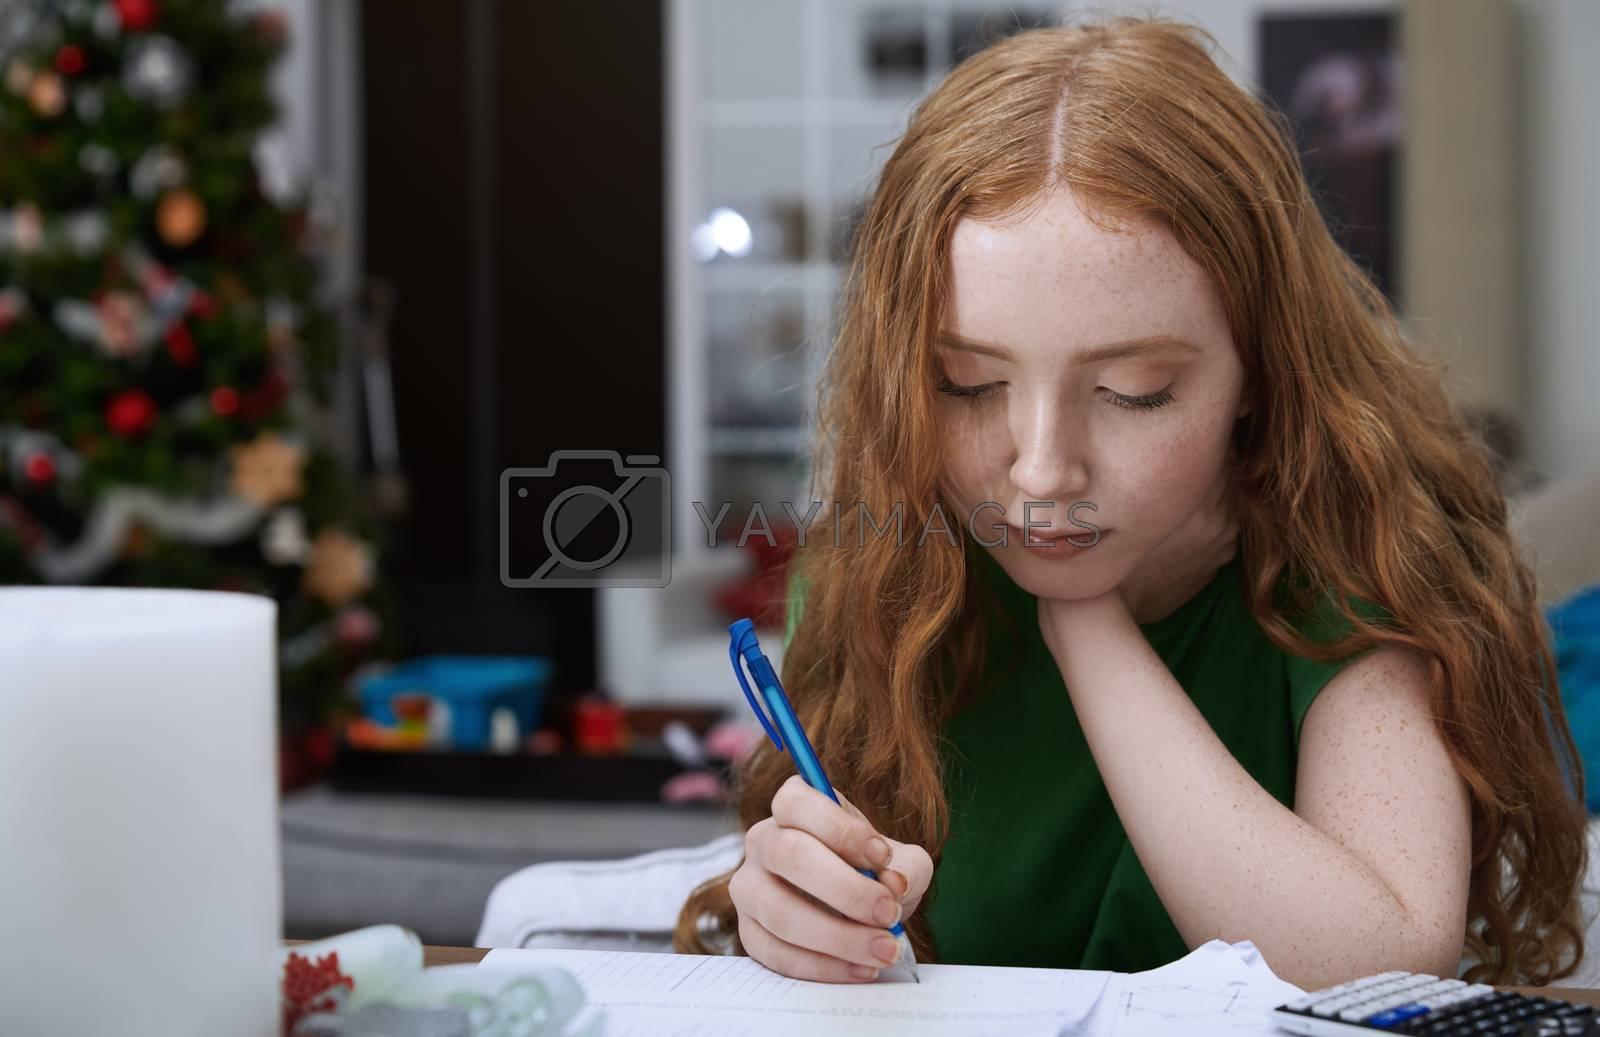 Teenage girl (13-15 years) doing homework by Novic